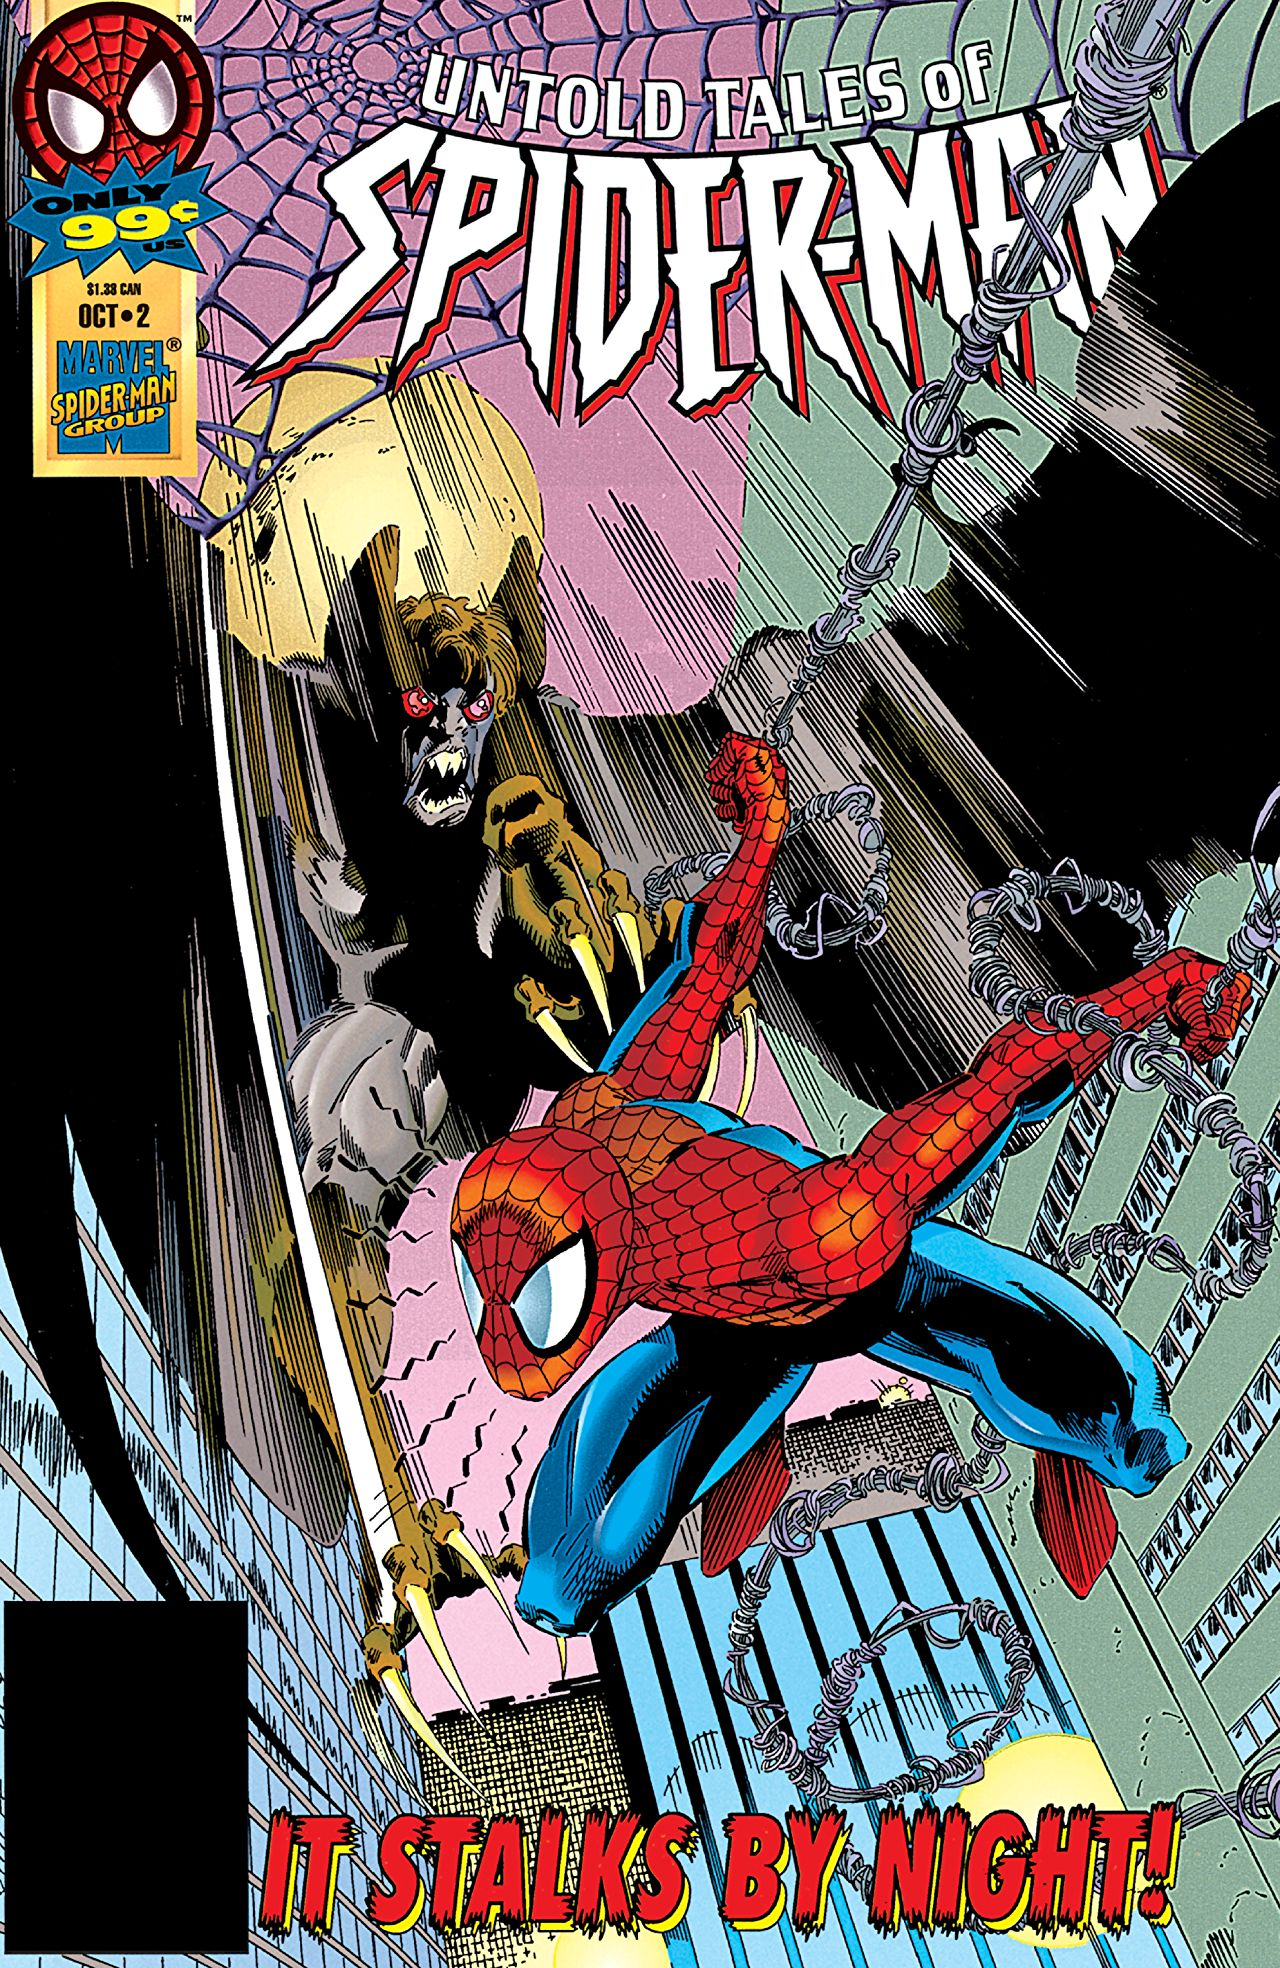 Untold Tales of Spider-Man Vol 1 2.jpg